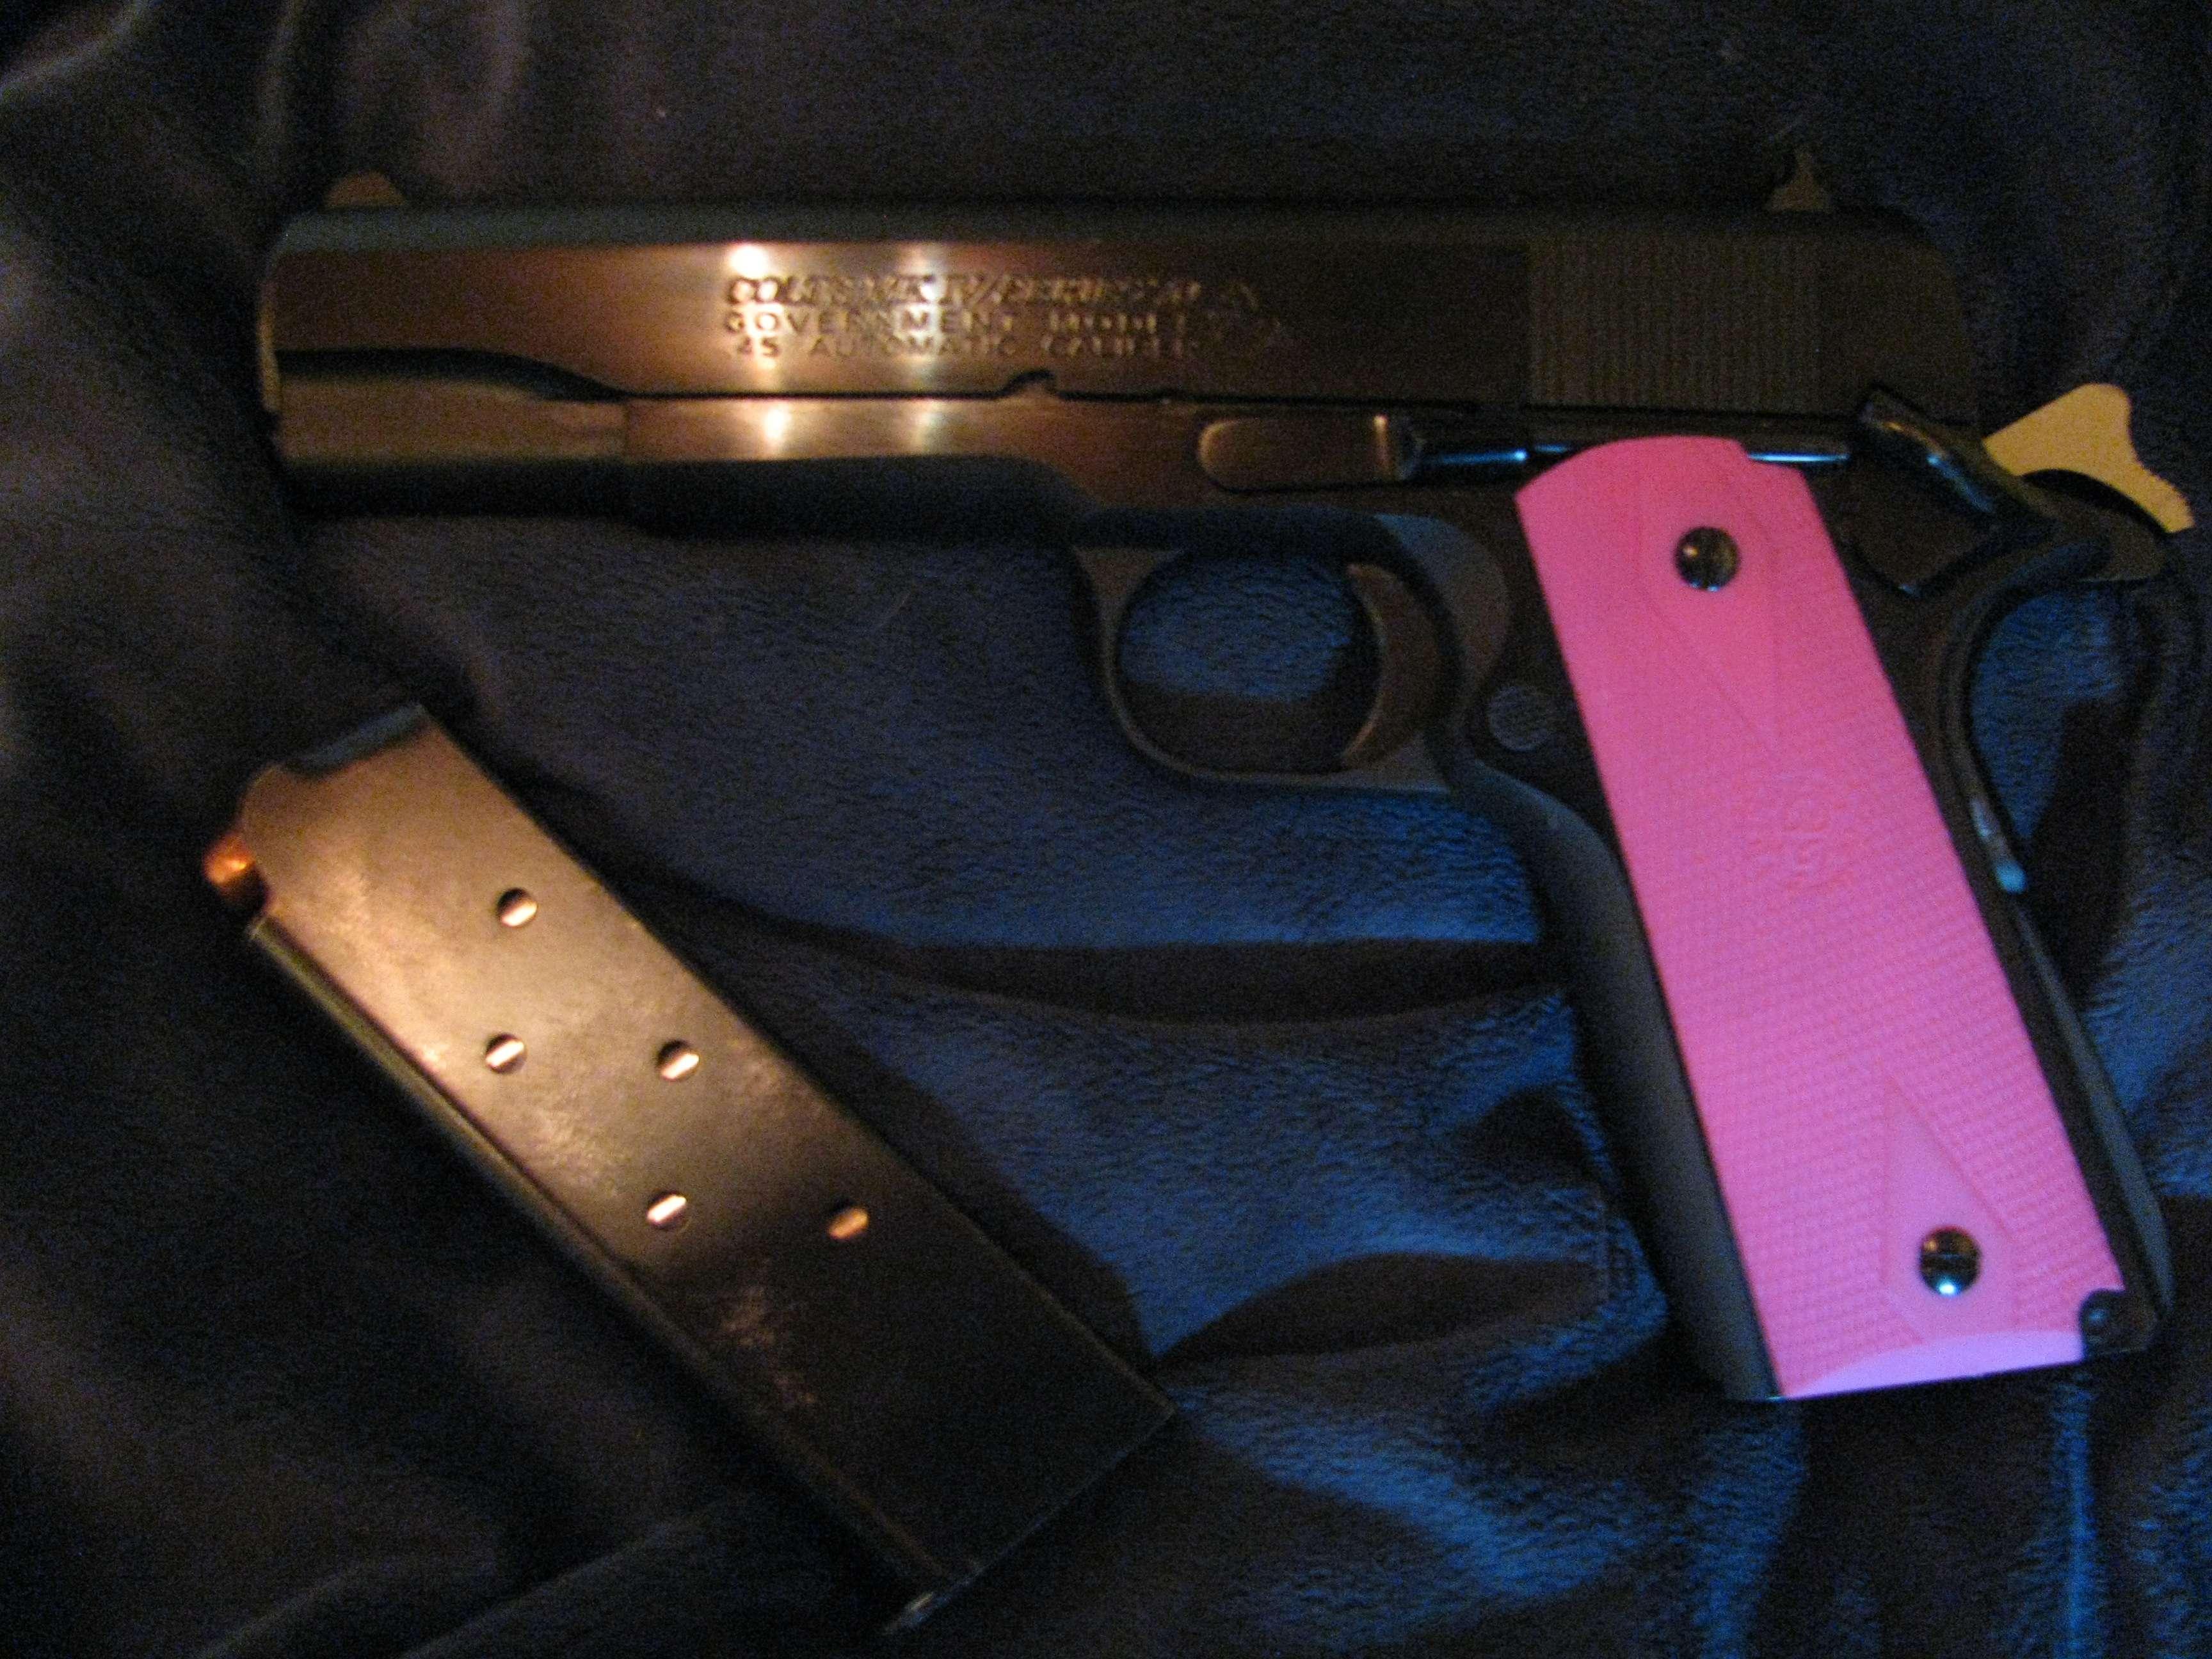 Design your ideal range & home defense pistol. - General Handgun Discussion